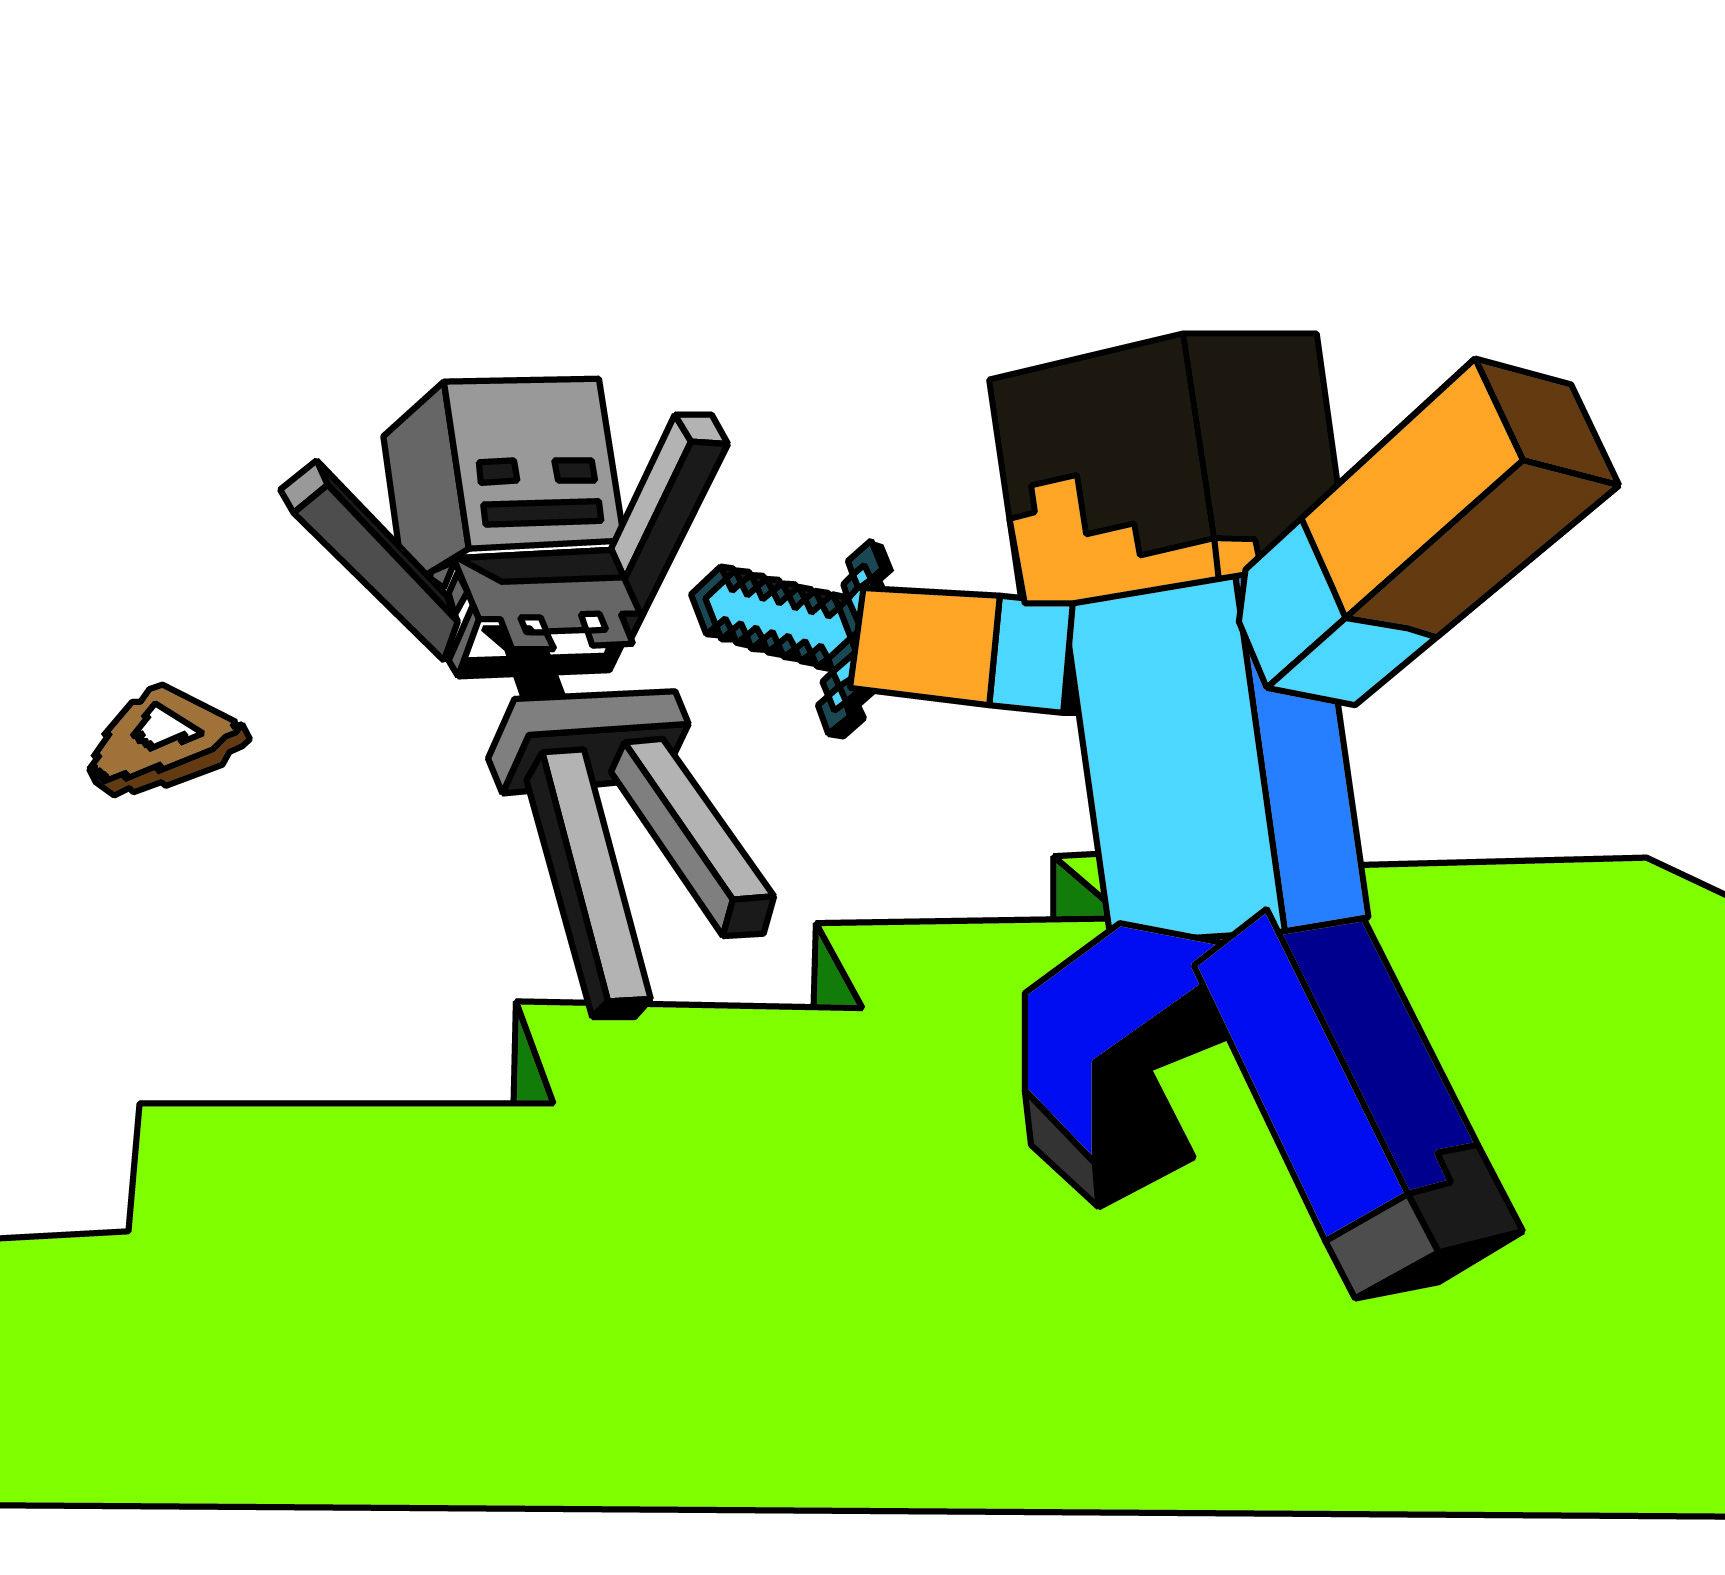 Minecraft on minecraft minecraft blanket and coloring minecraft